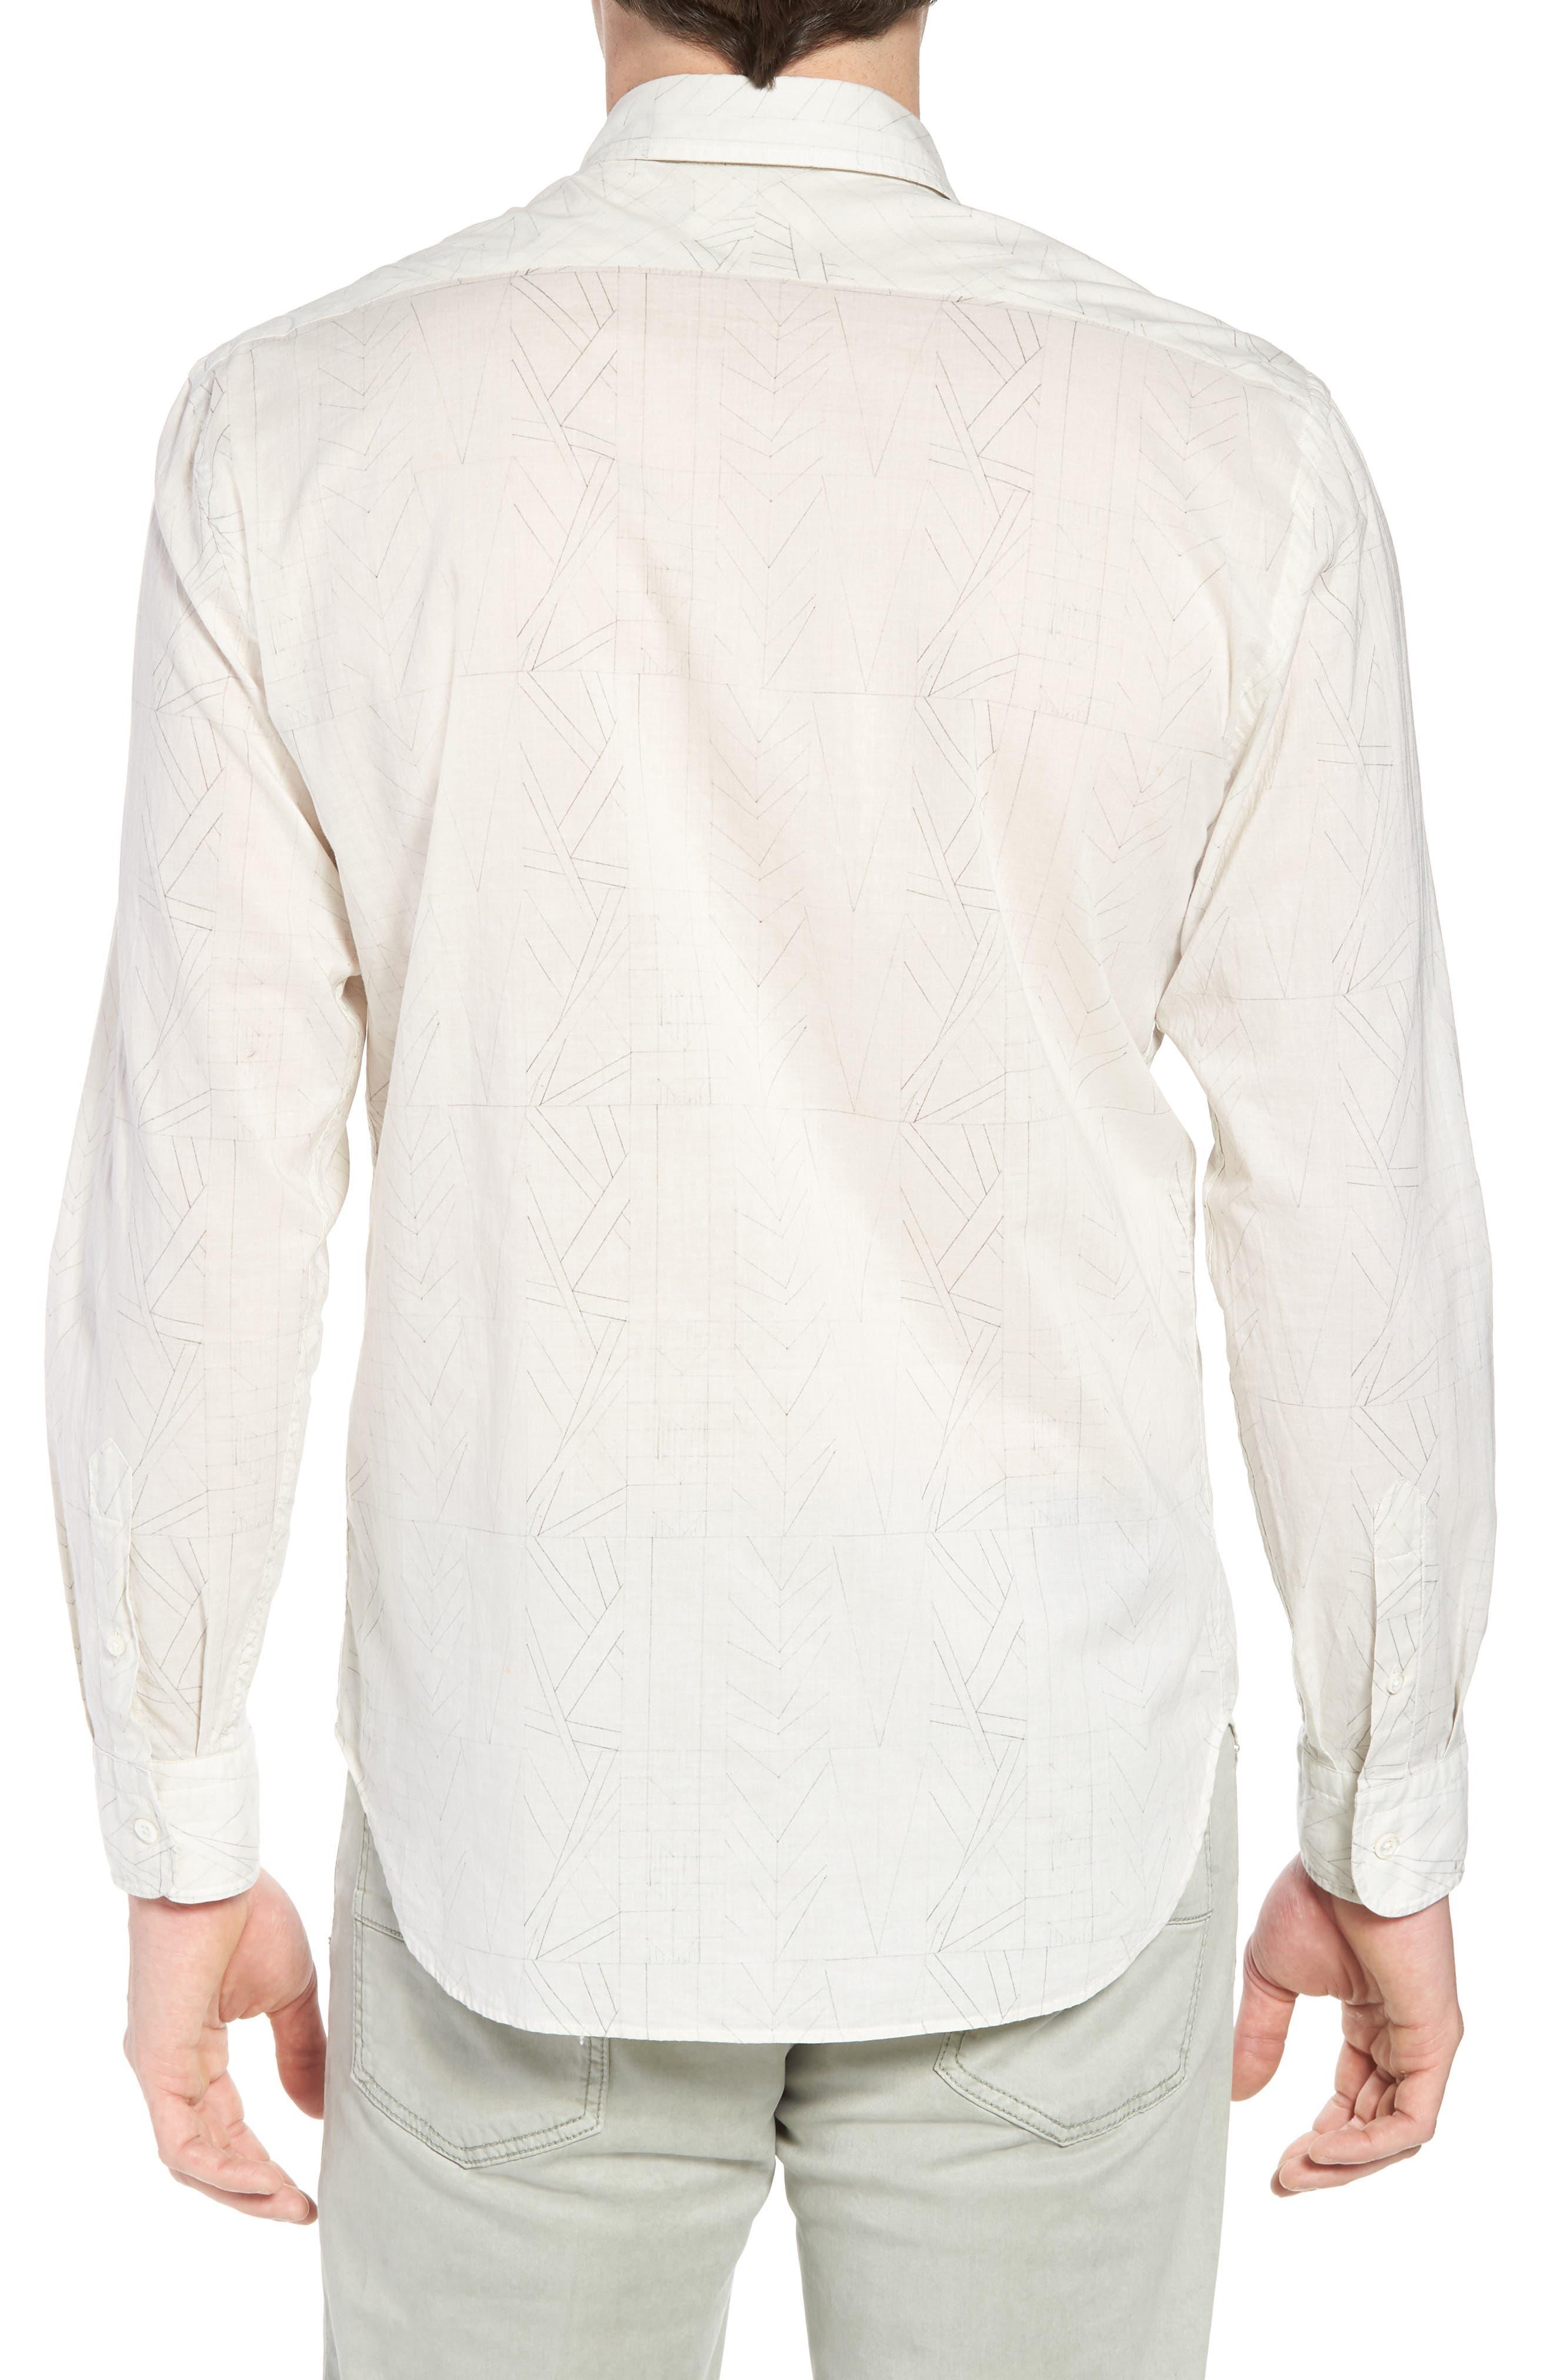 John Sport Shirt,                             Alternate thumbnail 2, color,                             Natural